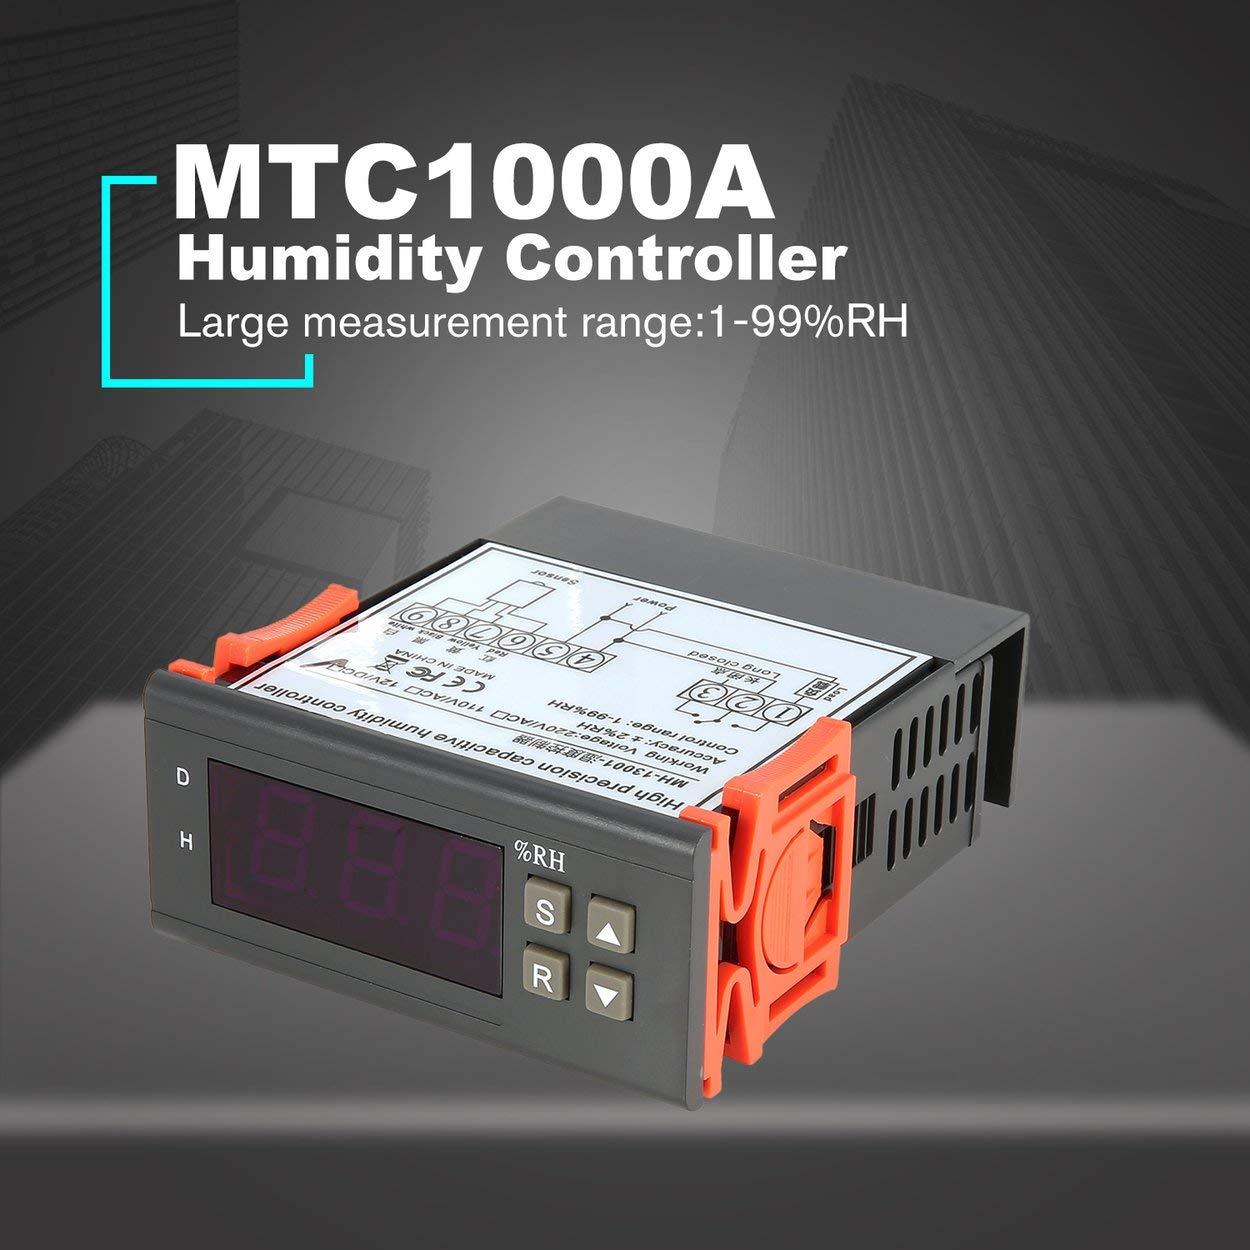 Lorenlli Fit MTC1000A DC 12 V Digitale LED-Mikrocomputer-Feuchteregler Hygrometer Entfeuchten Schaltrelais Hygrostat 0-99% RH-Steuerung